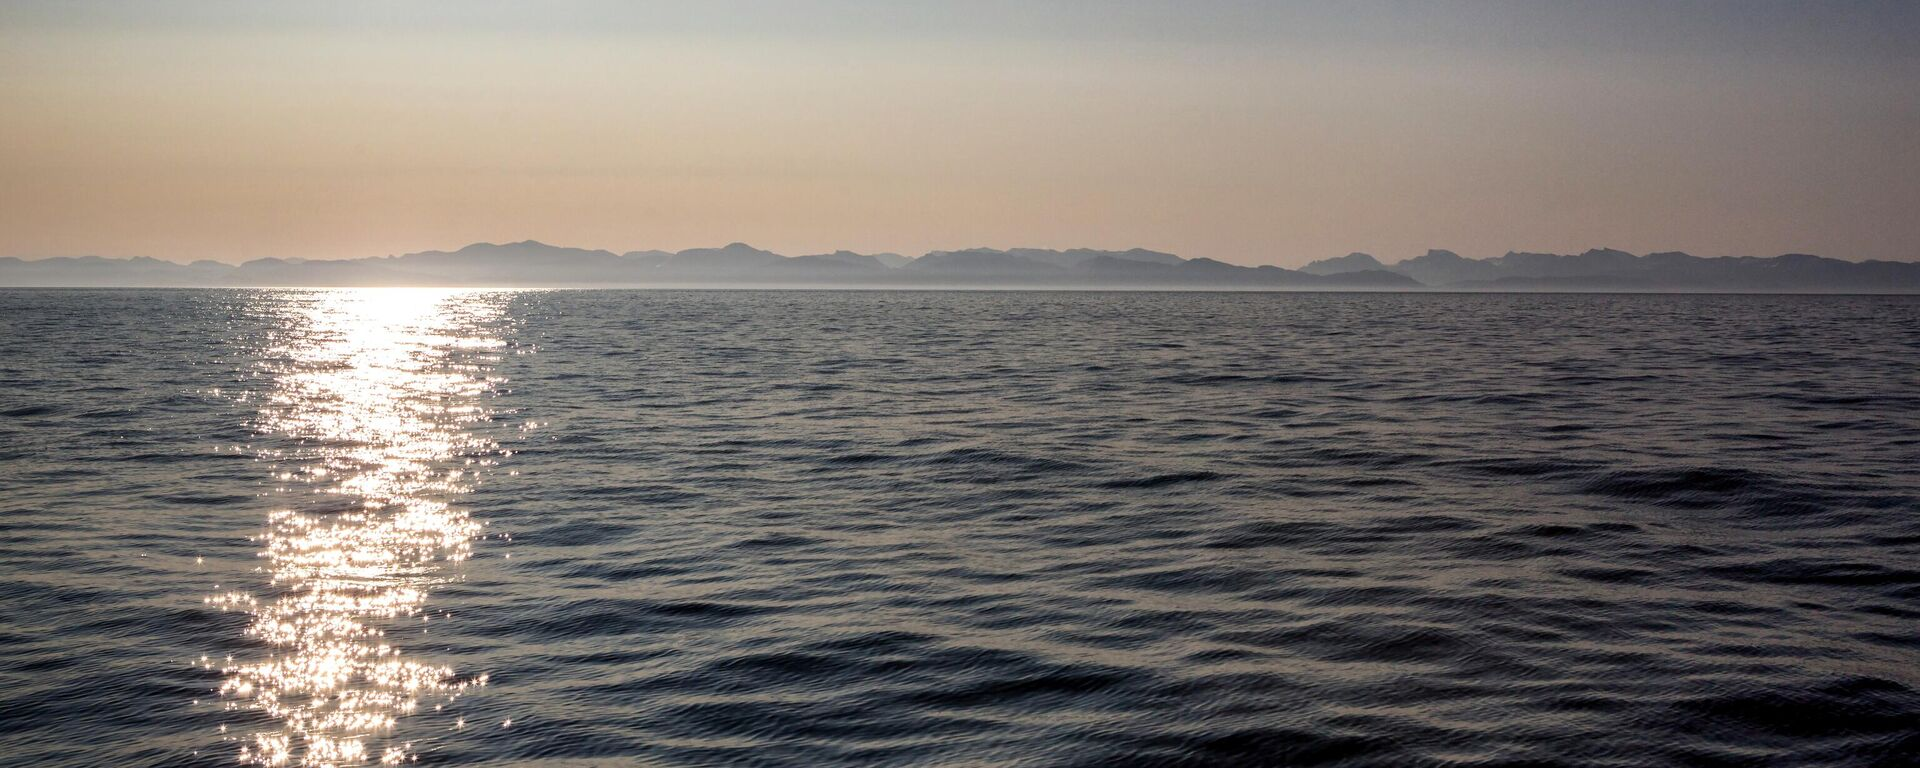 Ozean (Archiv) - SNA, 1920, 19.03.2021